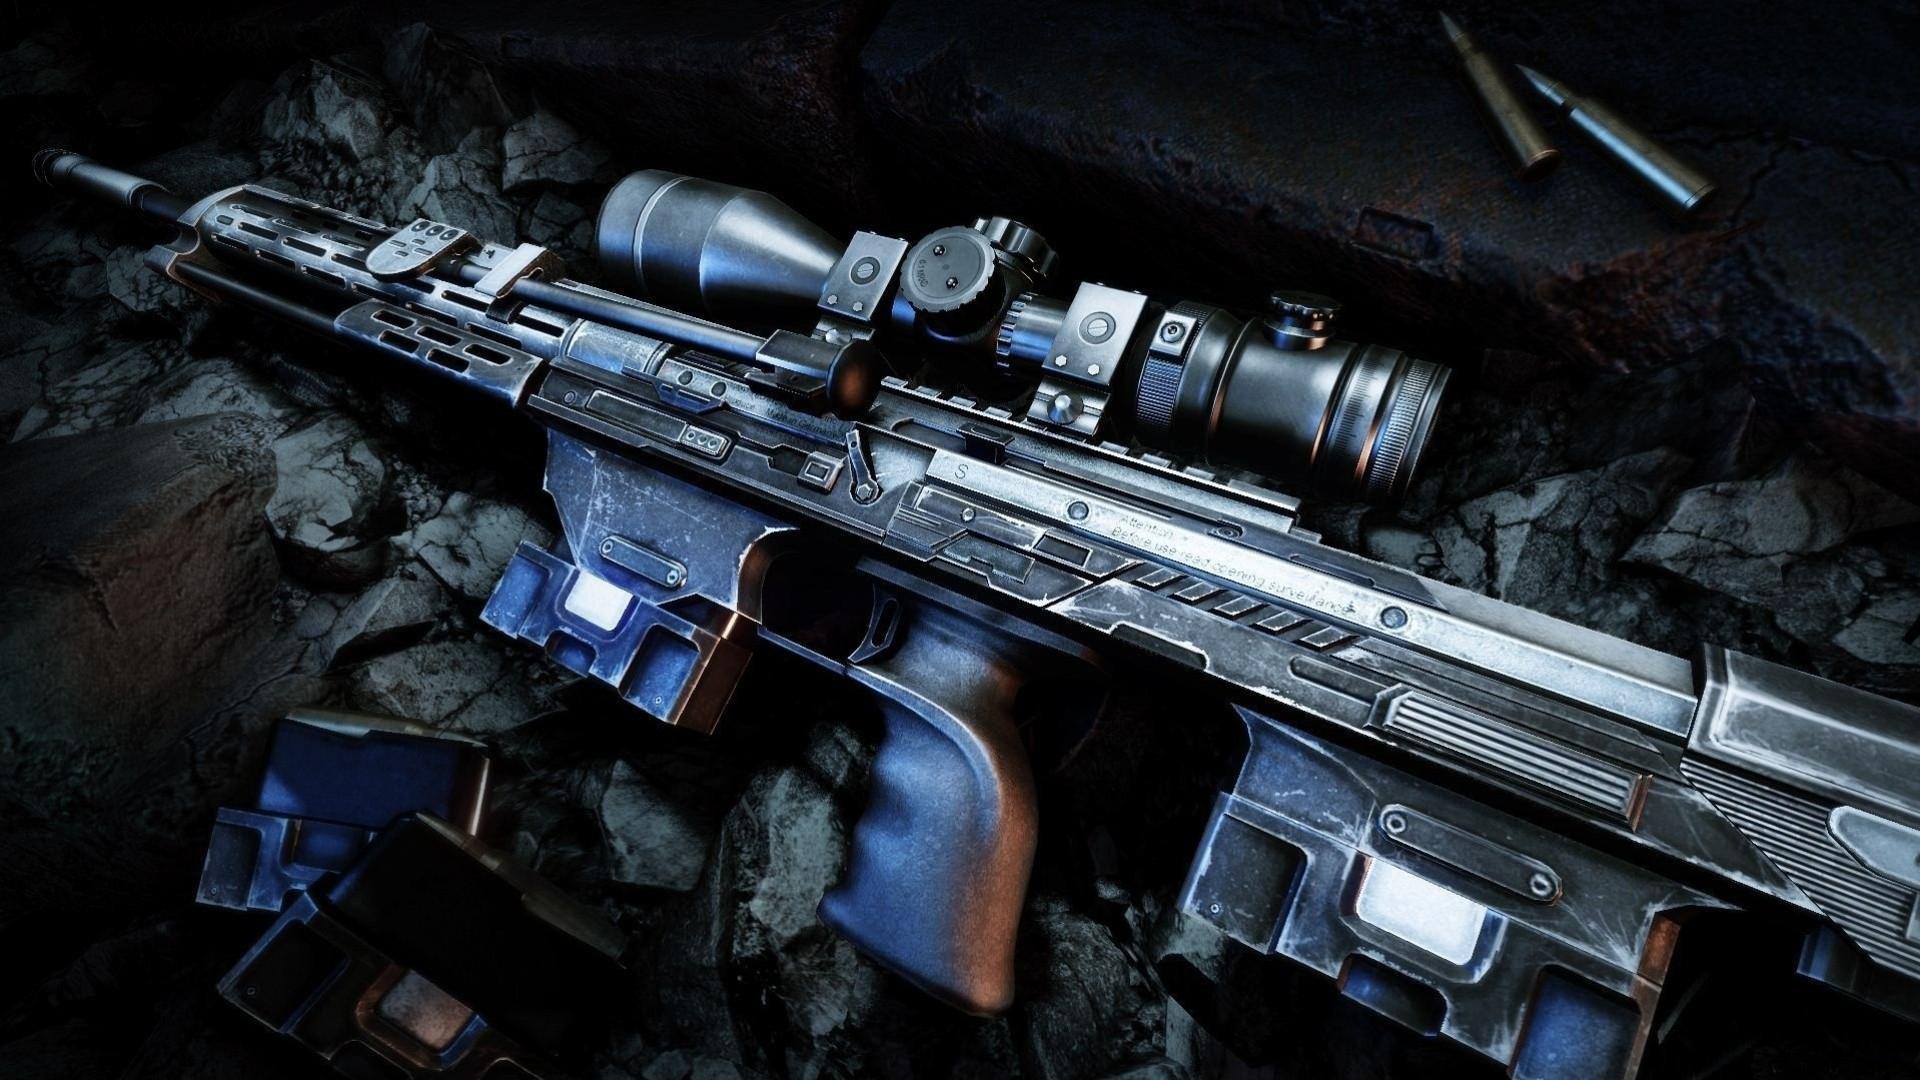 Cross-Eyed Stereogram Gallery : Stereogram Images. - Hidden 3D Sniper gun photos free download